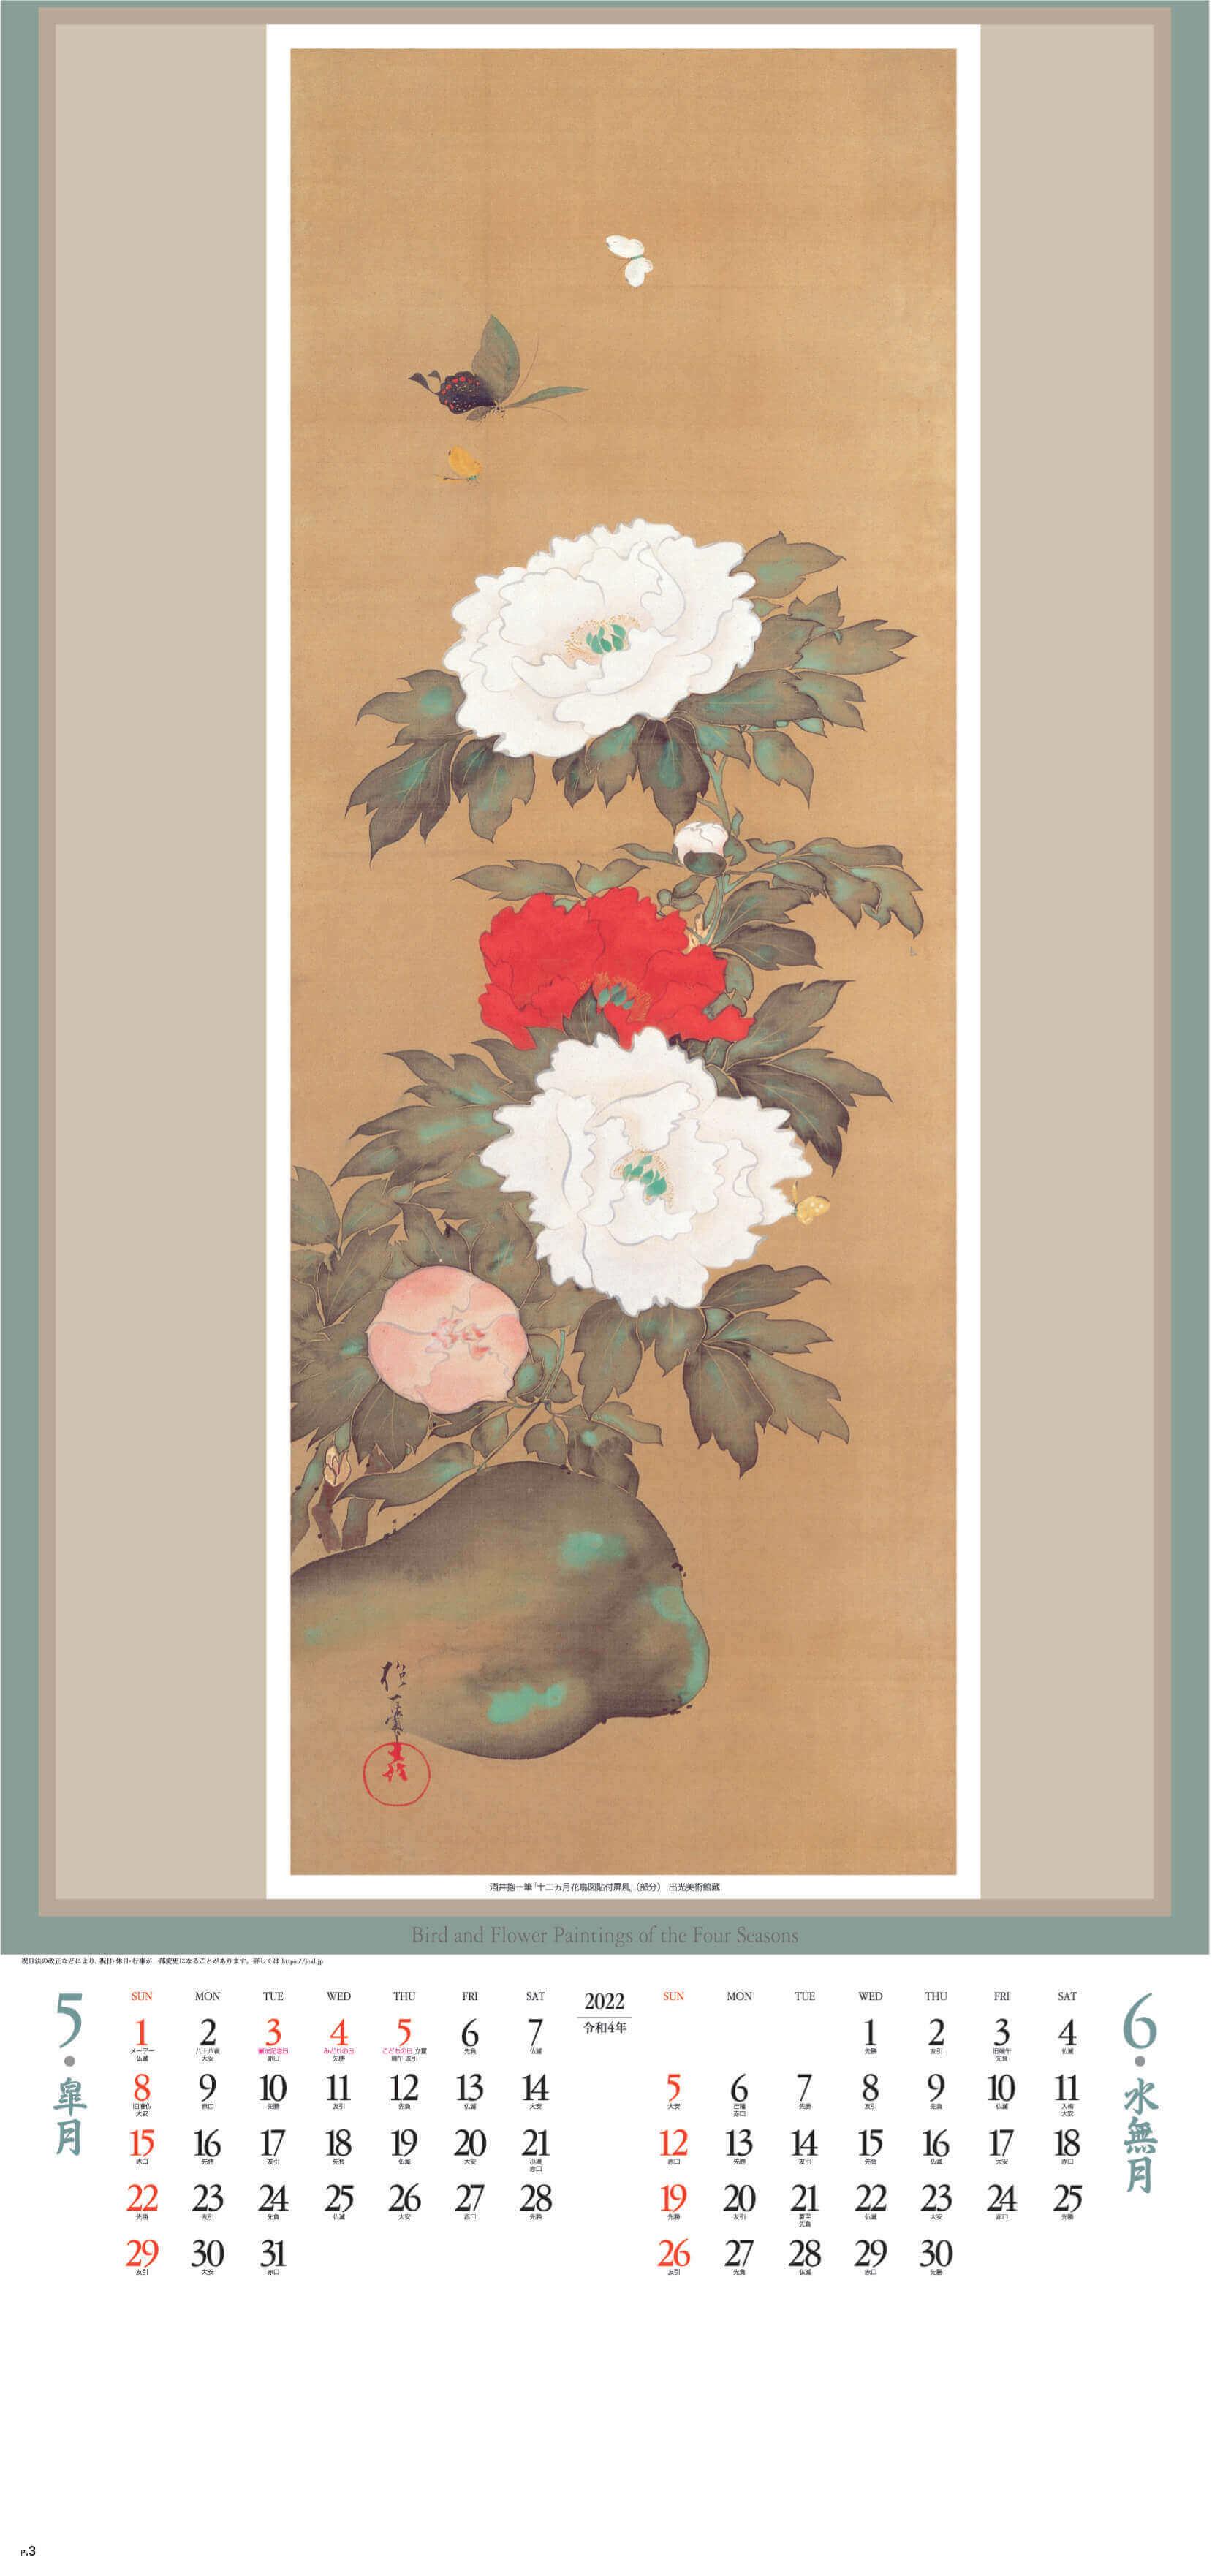 5-6月 酒井方一「十二ヵ月花鳥図貼付屏風」 江戸花鳥画集 紐付き 2022年カレンダーの画像